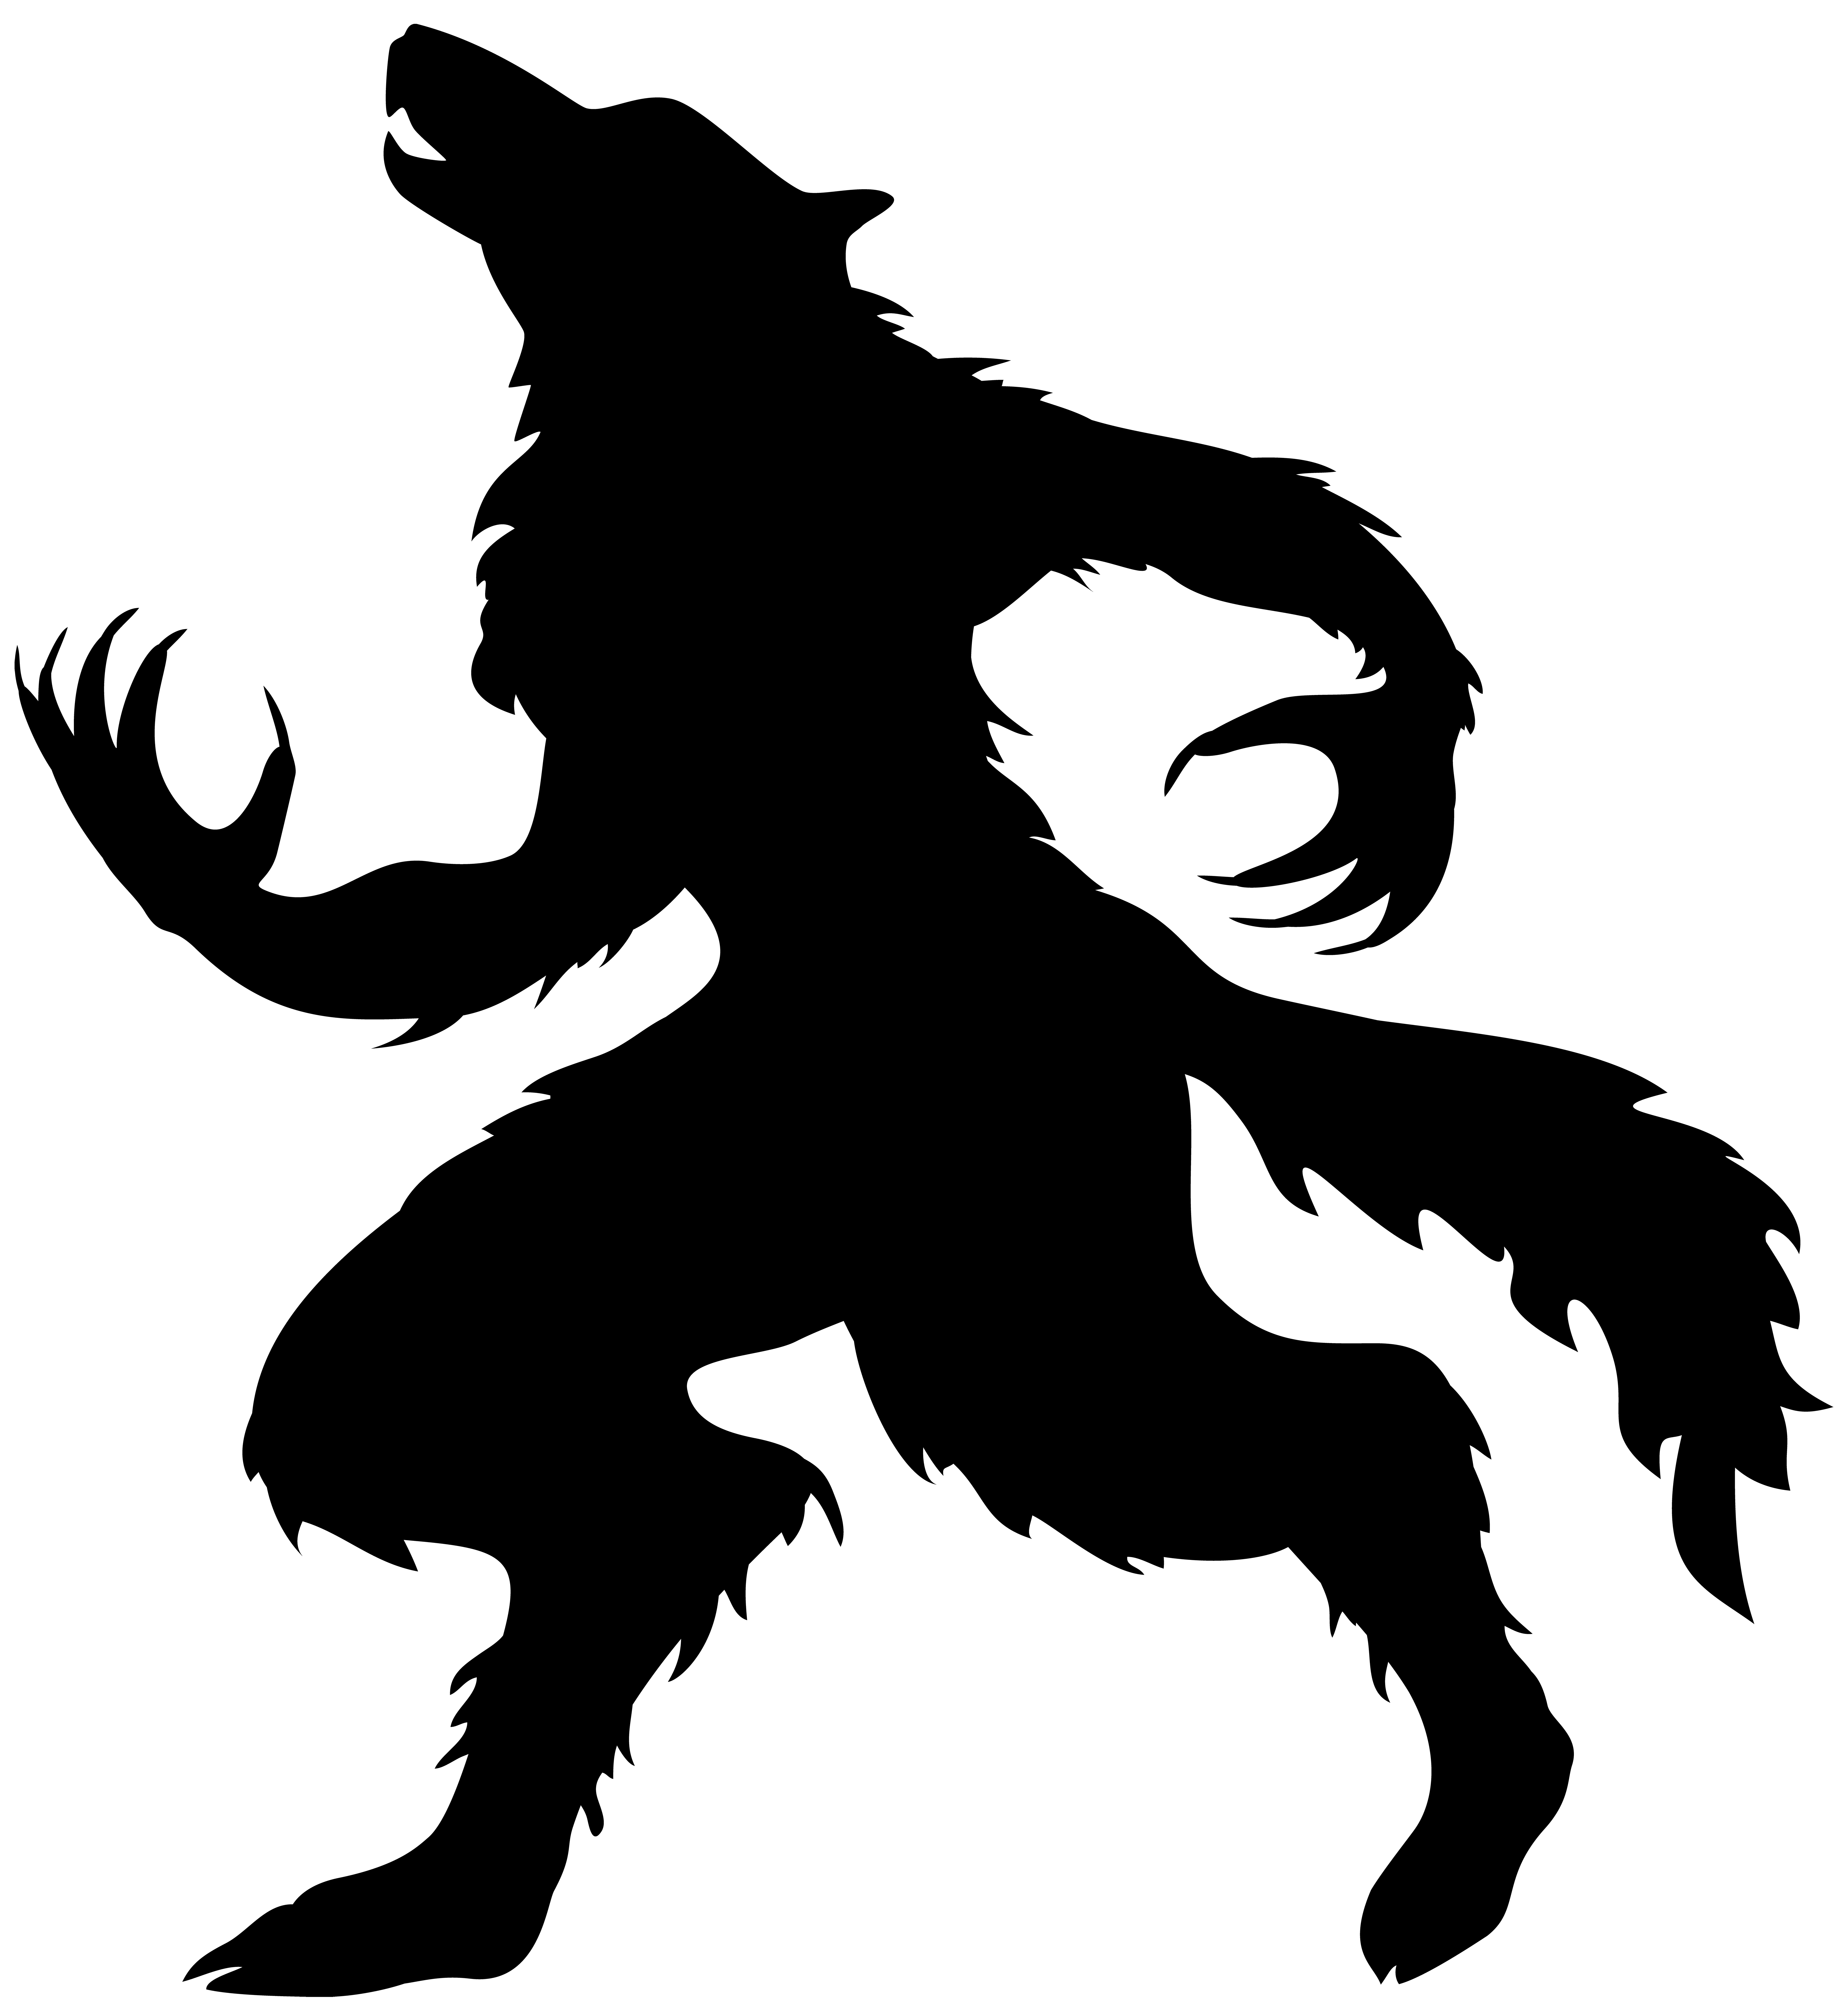 Halloween Werewolf Silhouette PNG Clip Art Image